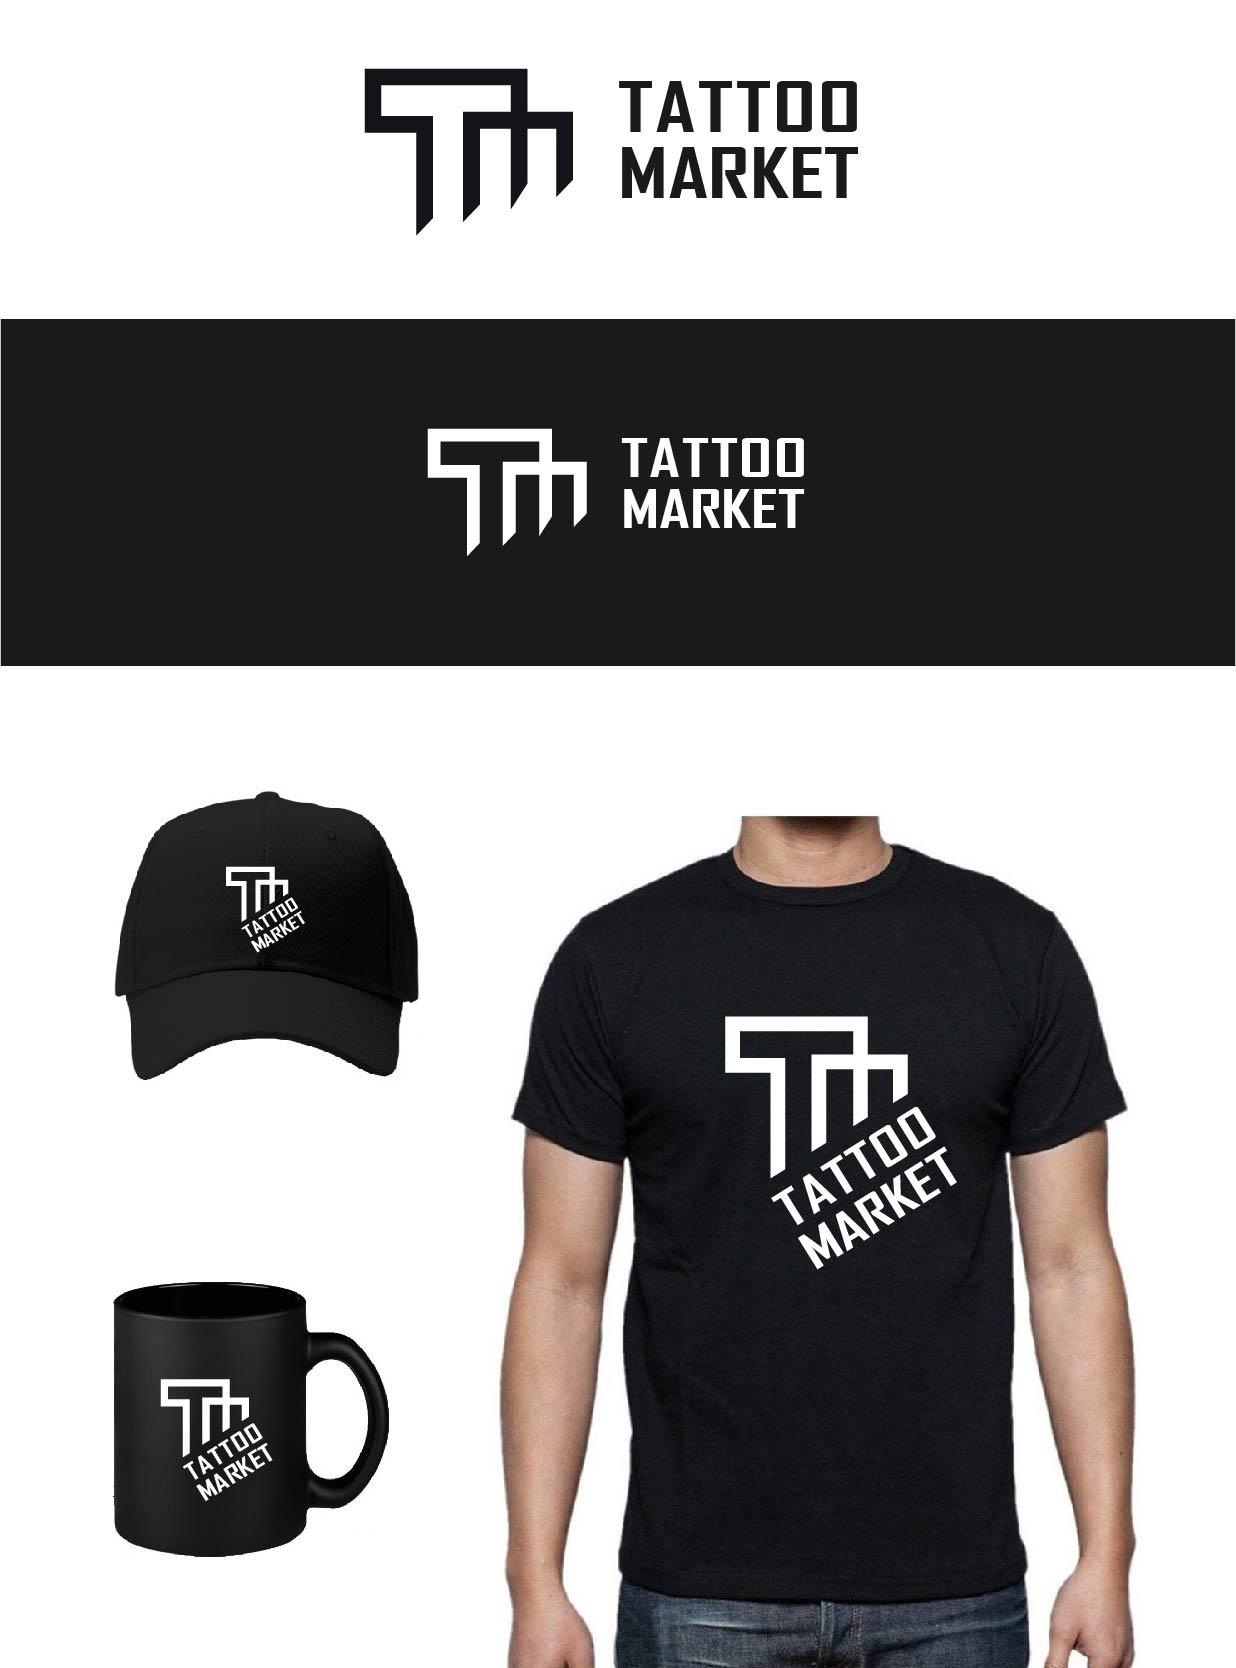 Редизайн логотипа магазина тату оборудования TattooMarket.ru фото f_6075c3f2efea63b9.jpg